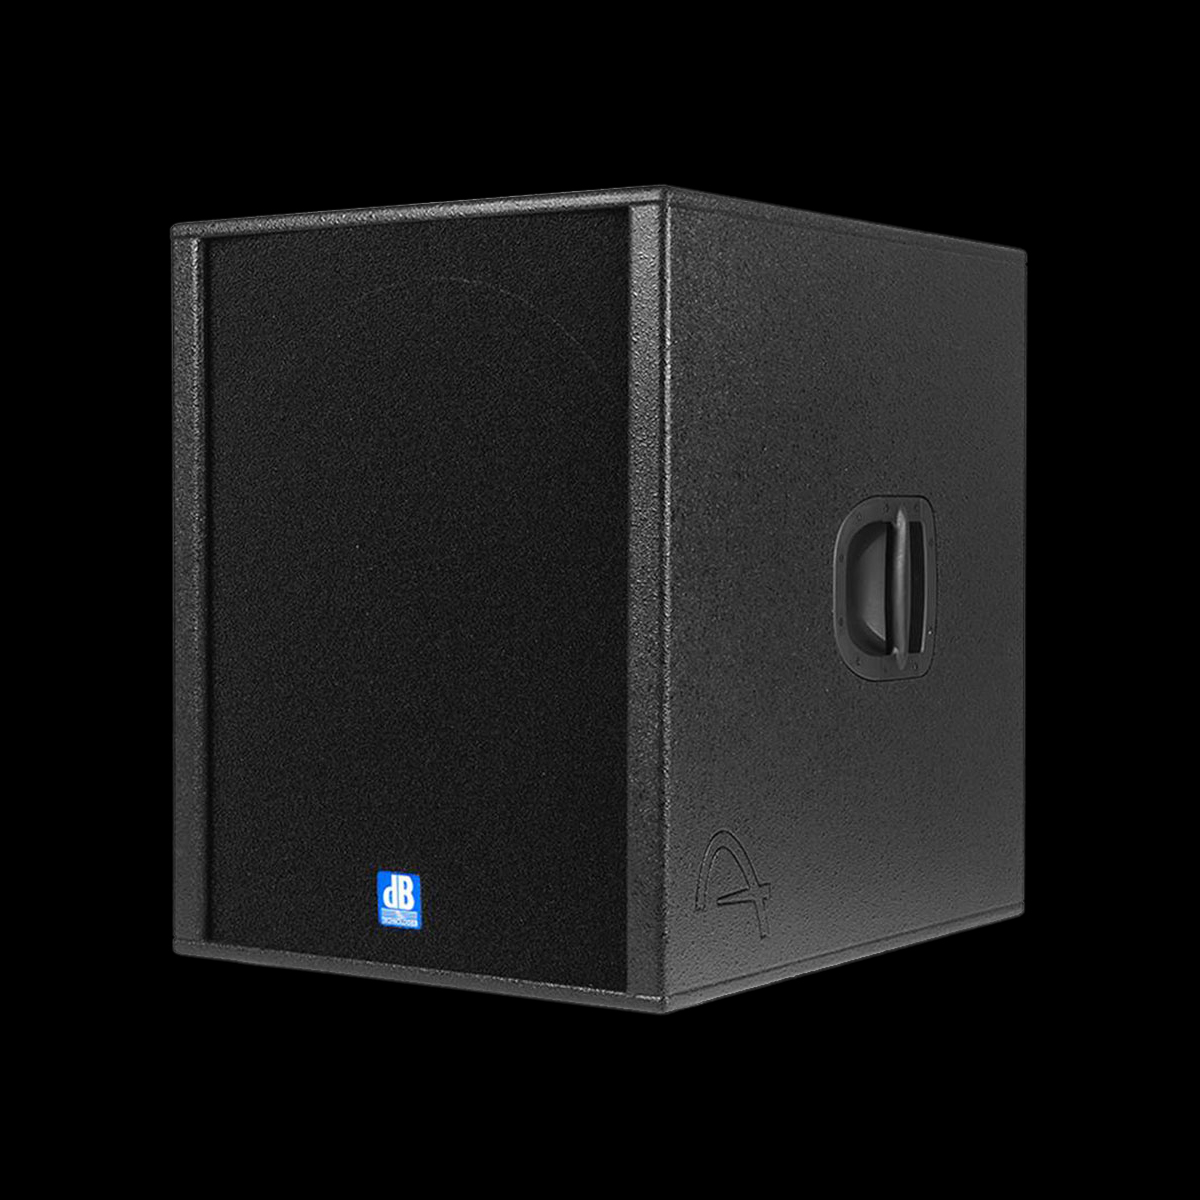 db technologies arena arena sw18 luidsprekerhoes grille voor baseline